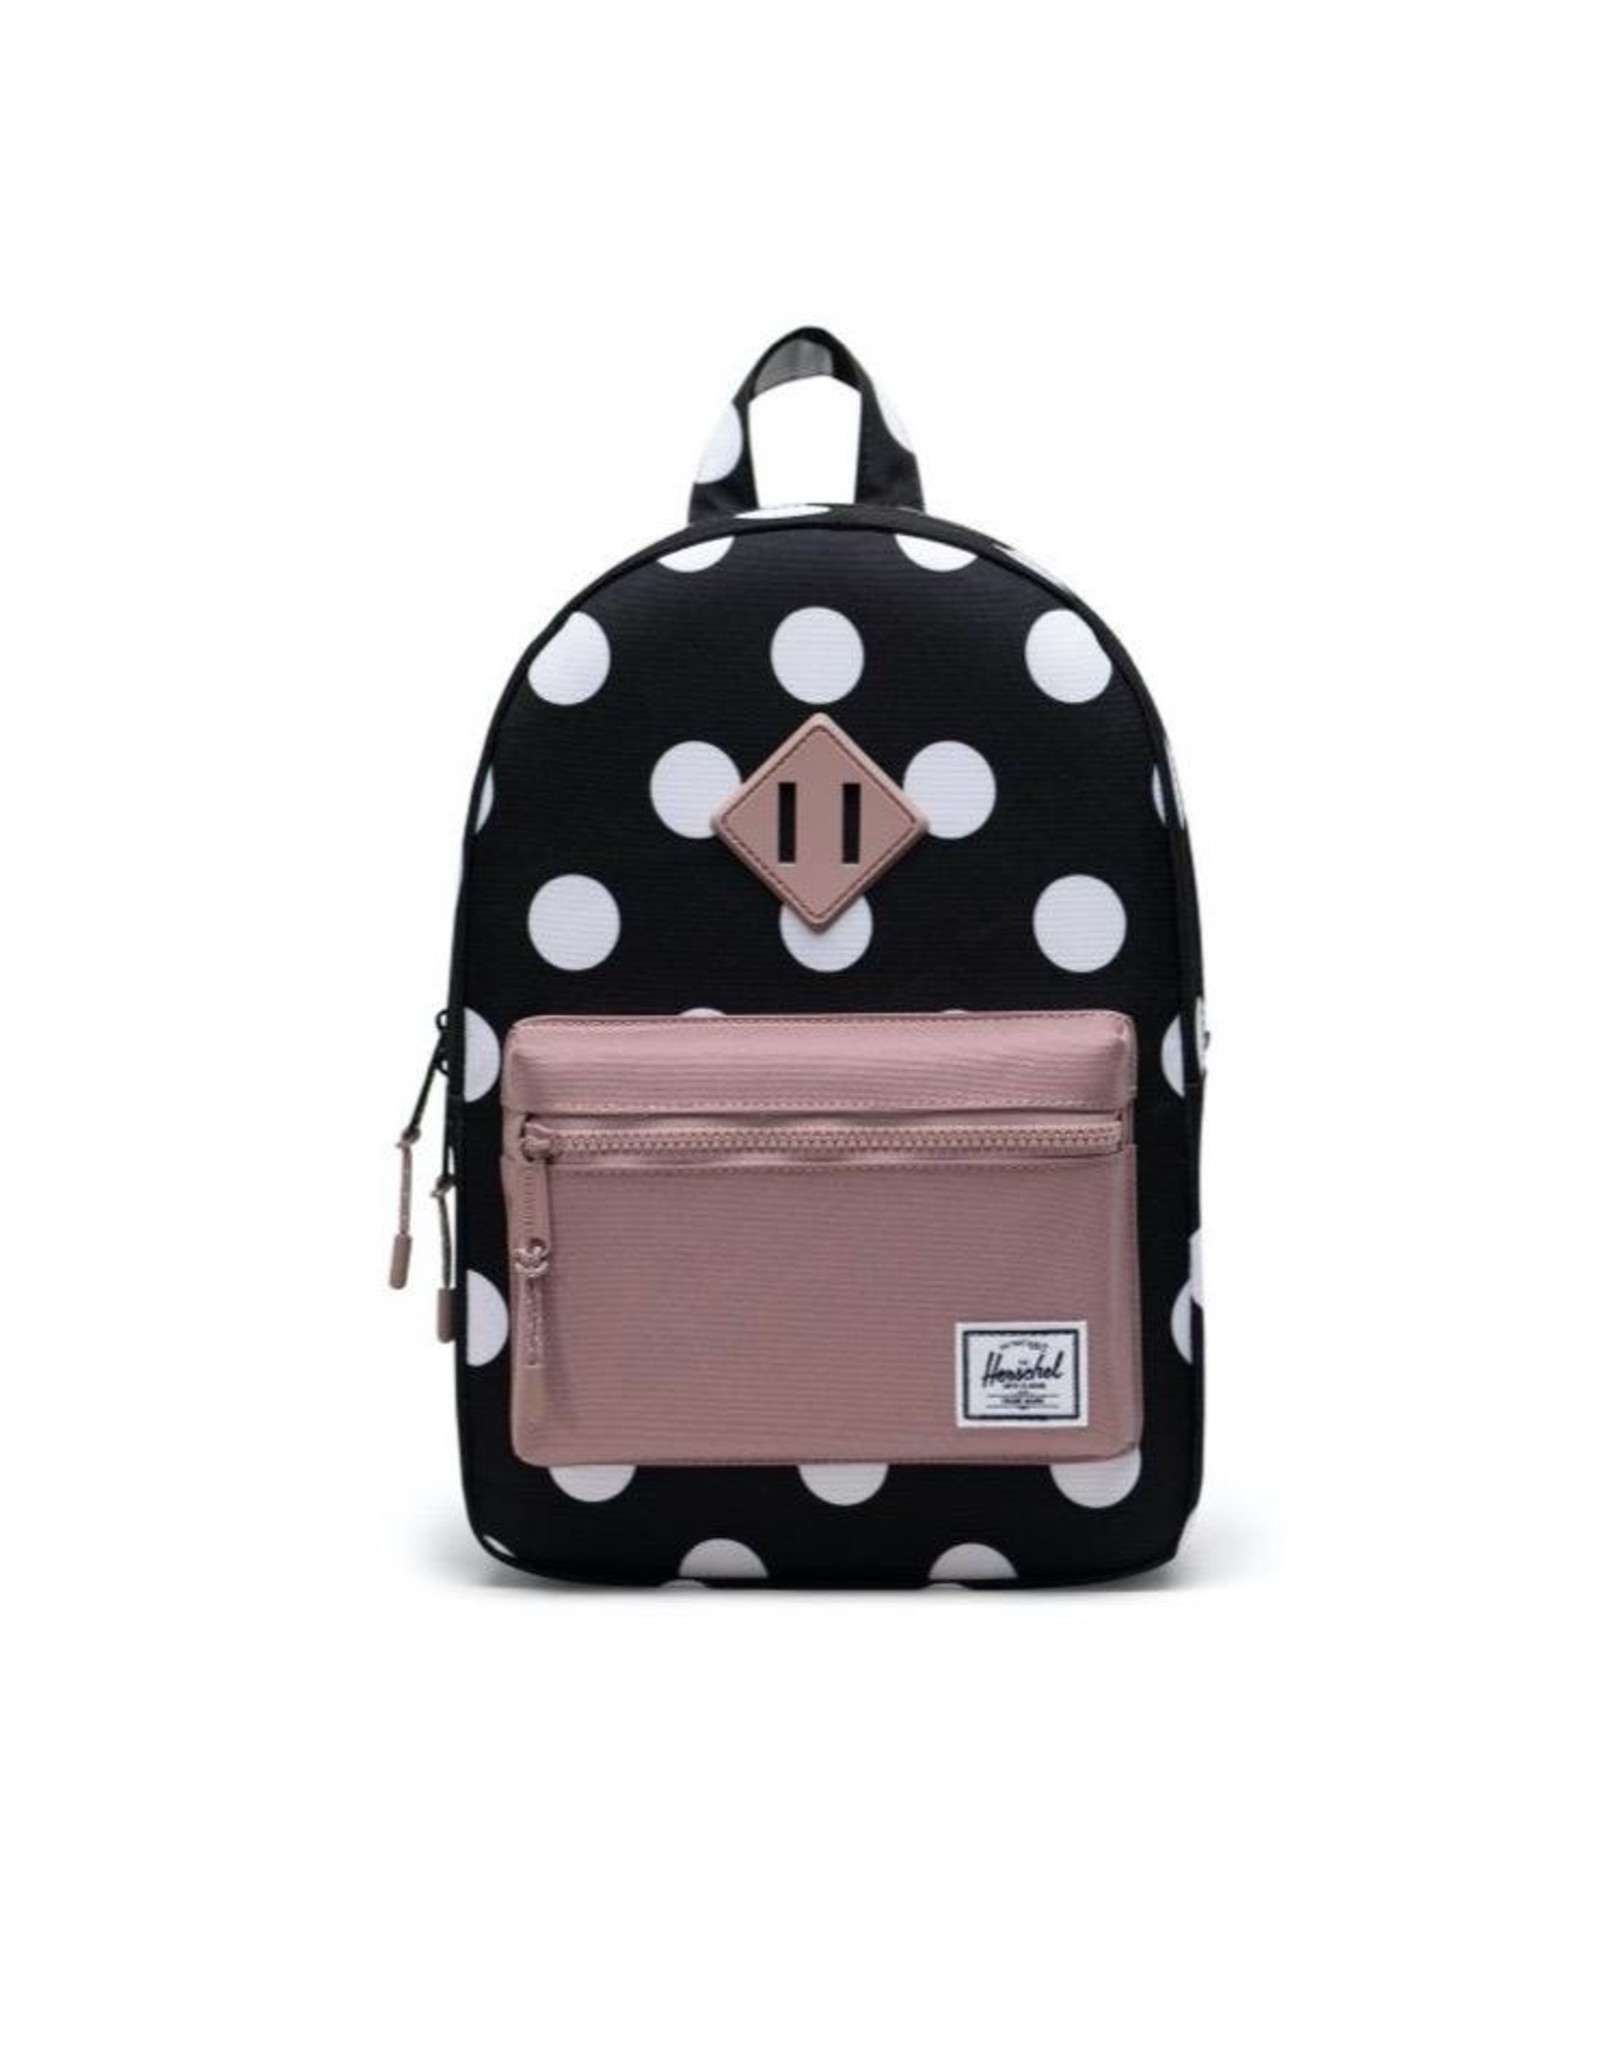 Herschel Supply Co. Heritage Backpack | Youth, Polka Dot Black and White/Ash Rose, 16L